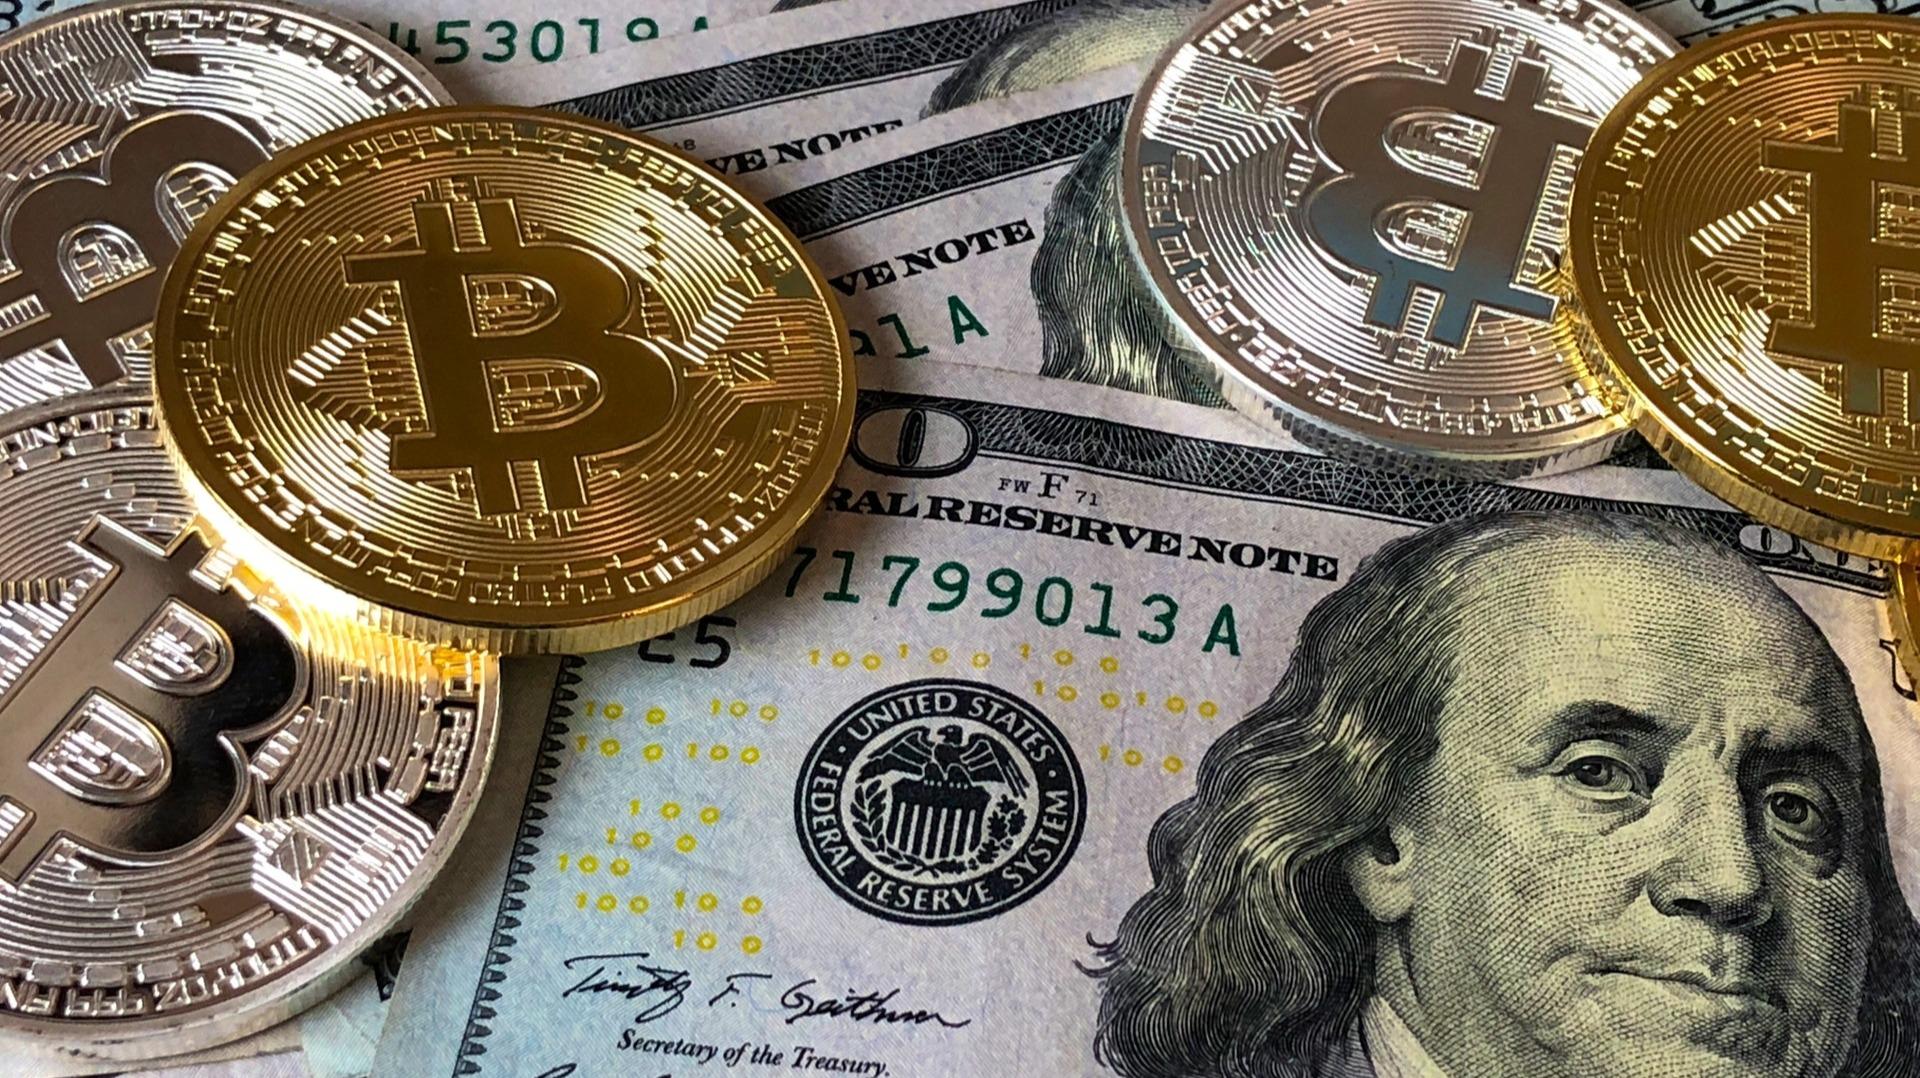 https://www.pexels.com/photo/bitcoins-and-u-s-dollar-bills-730547/